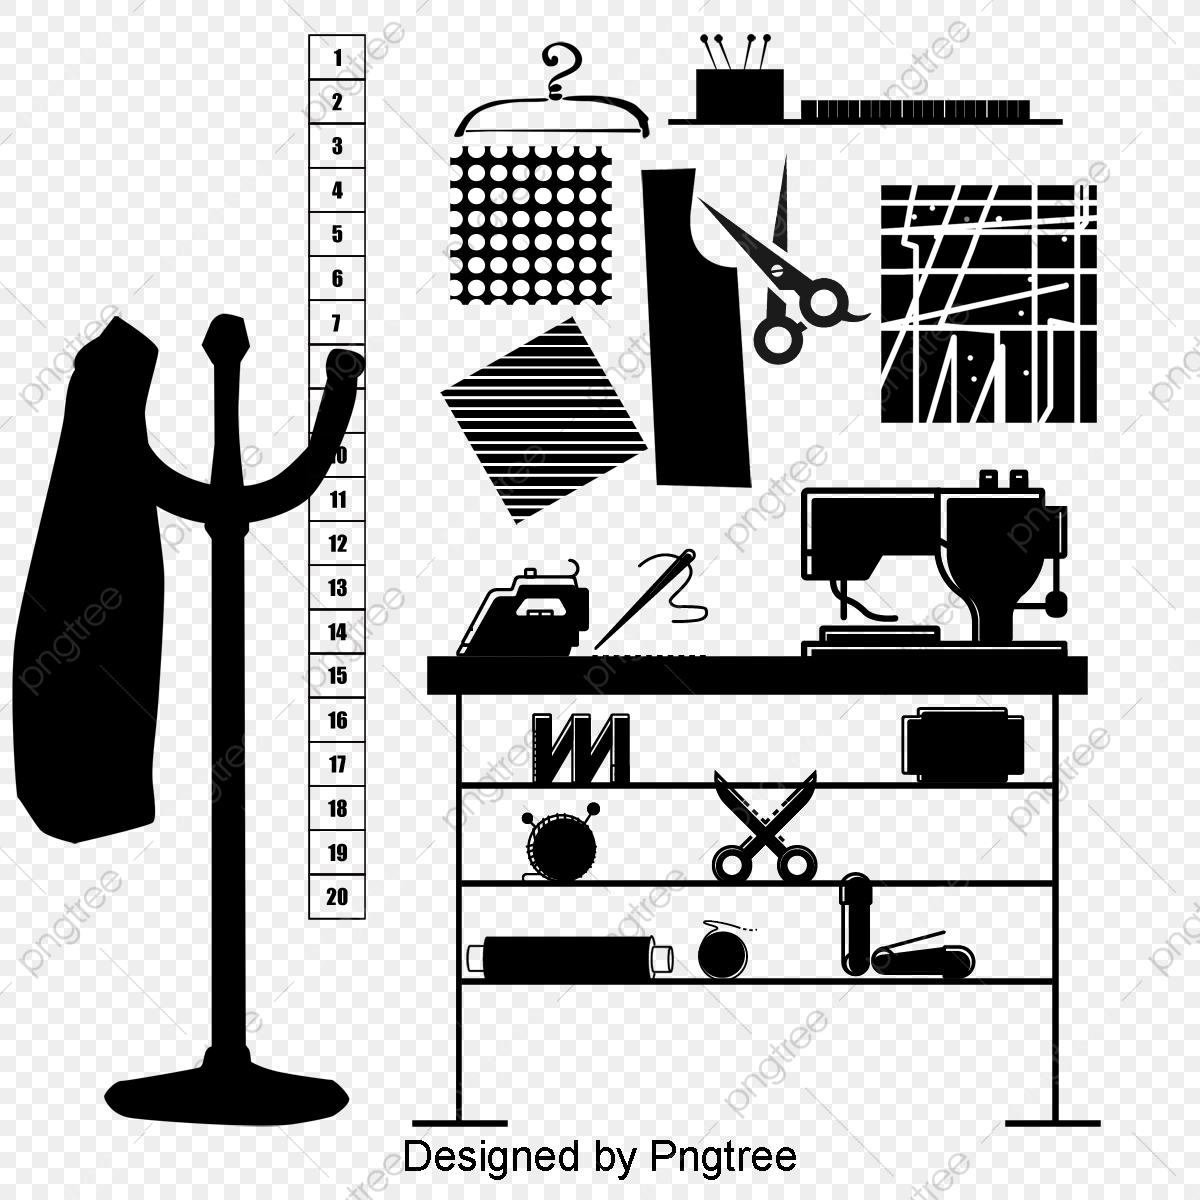 Vector Fashion Design Studio Fashion Vector Fashion Design Studio Png Transparent Clipart Image And Psd File For Free Download